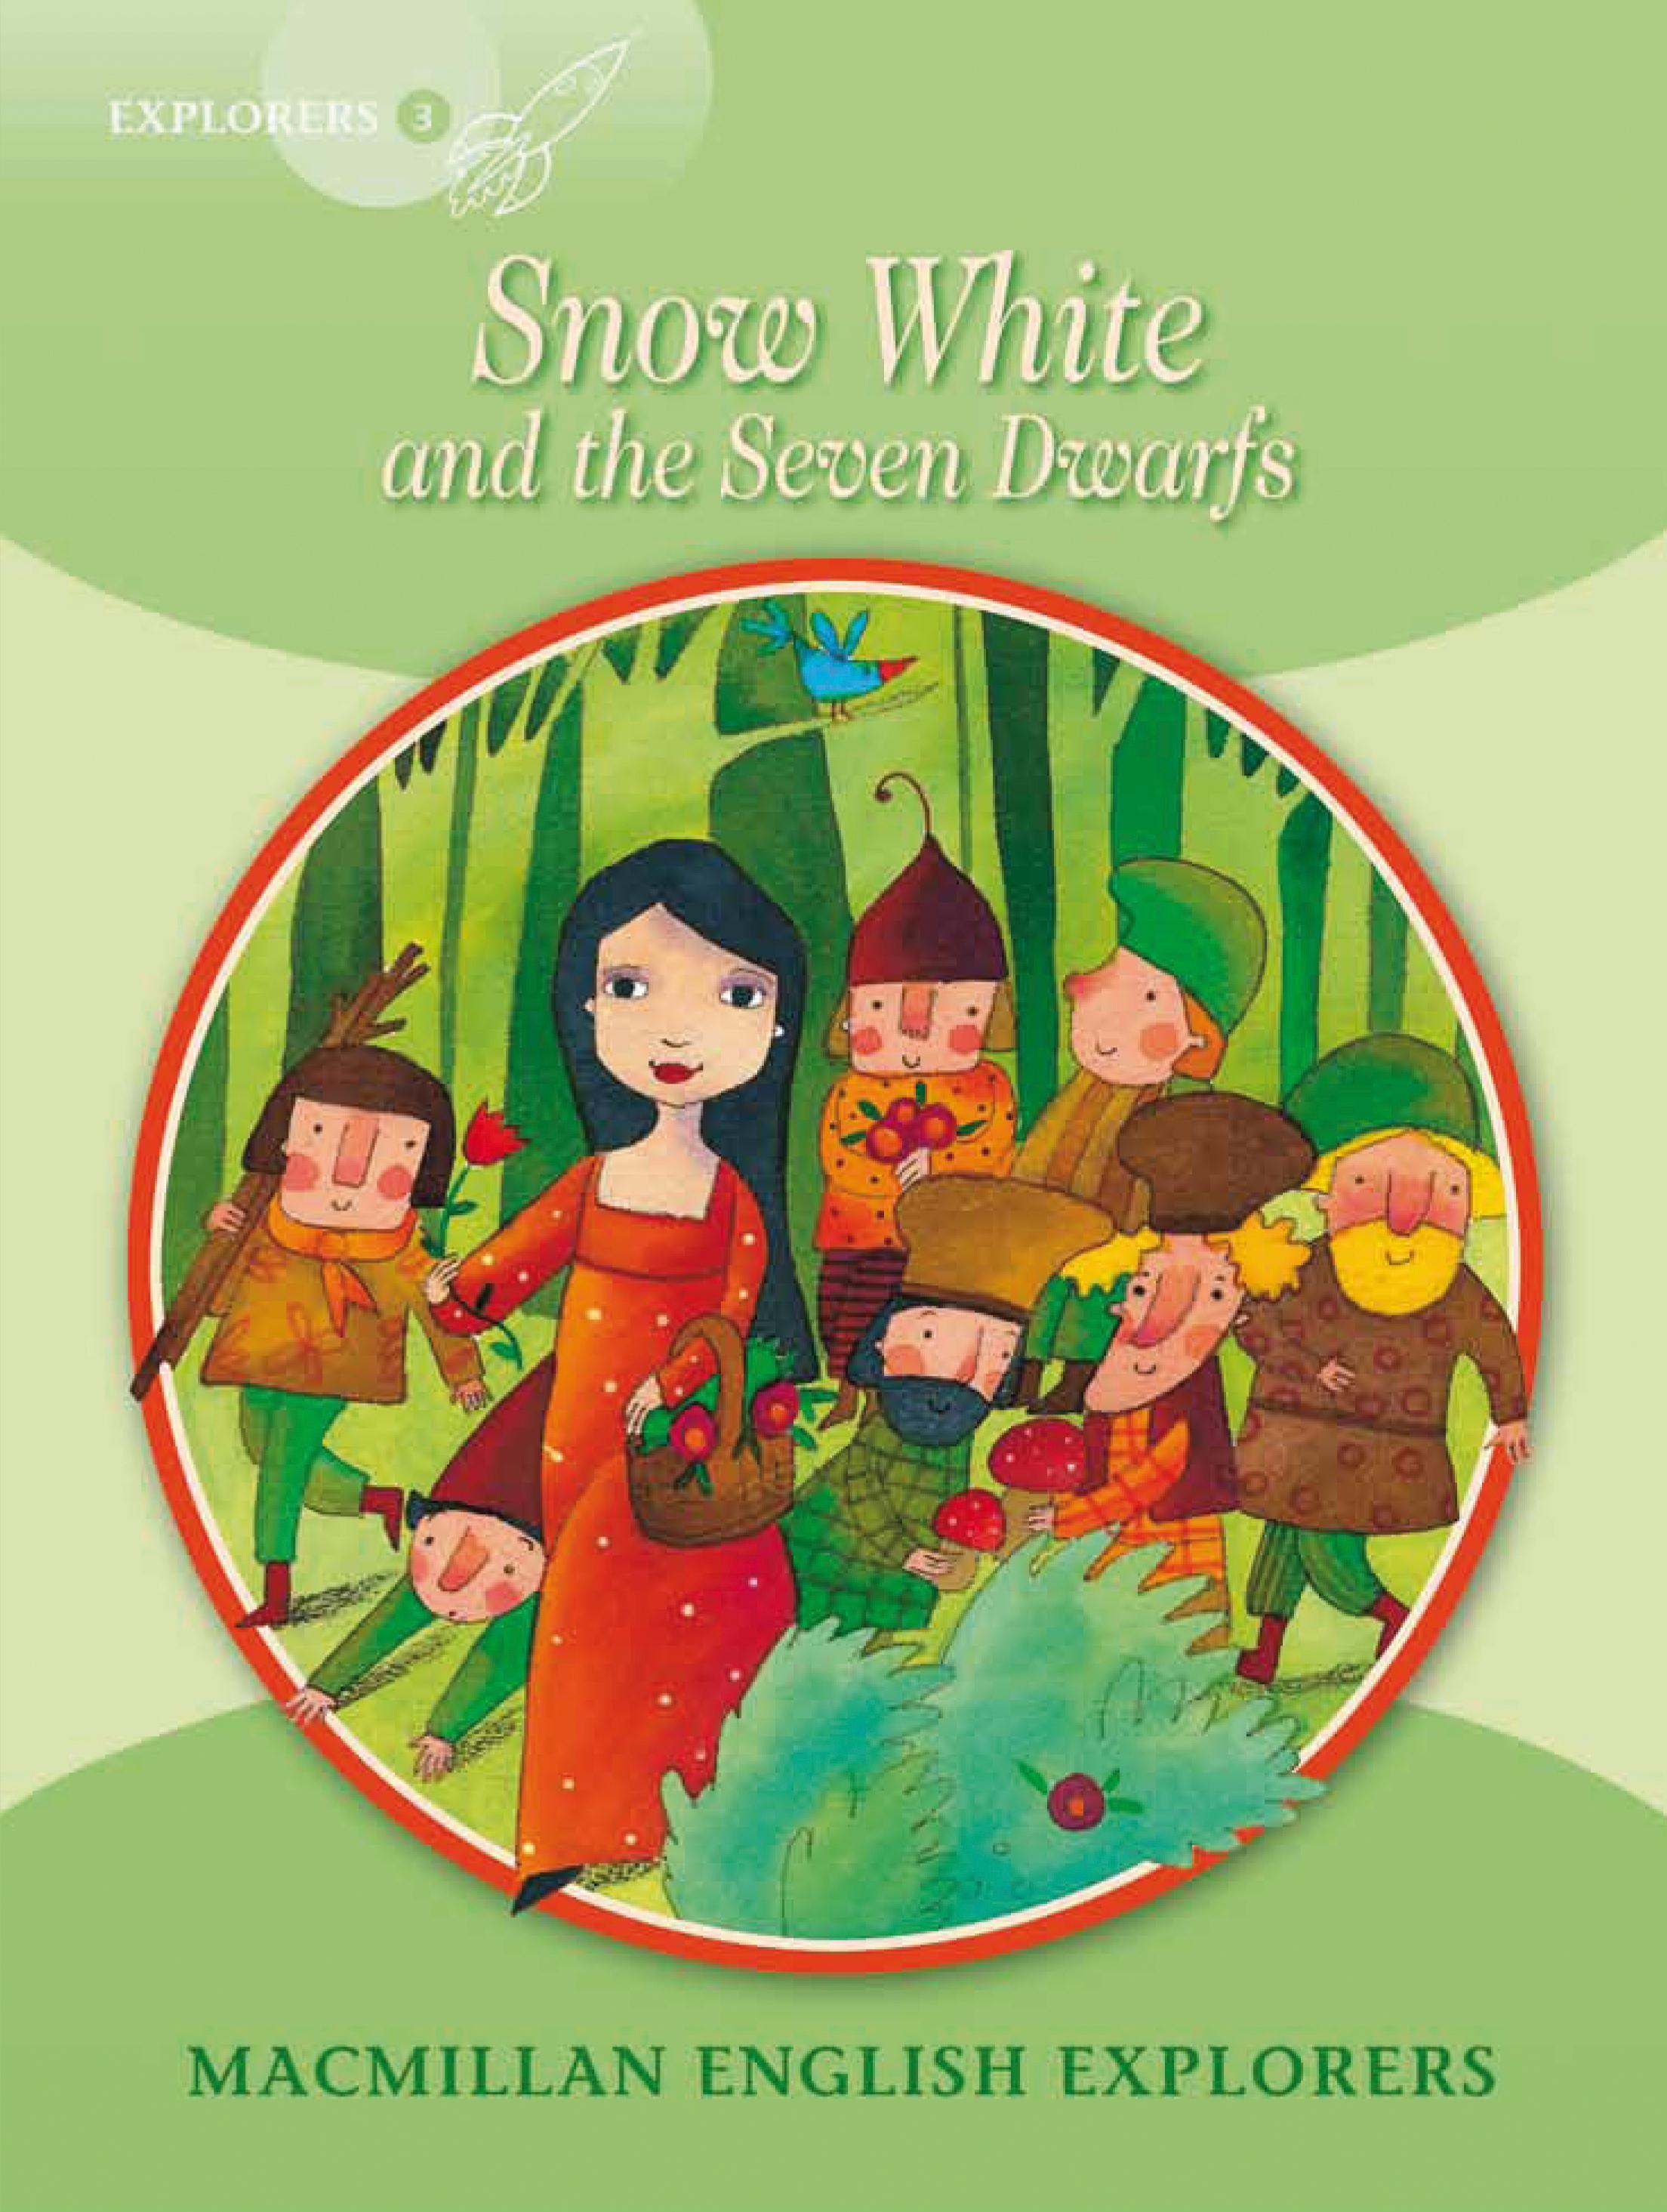 Explorers 3: Snow White